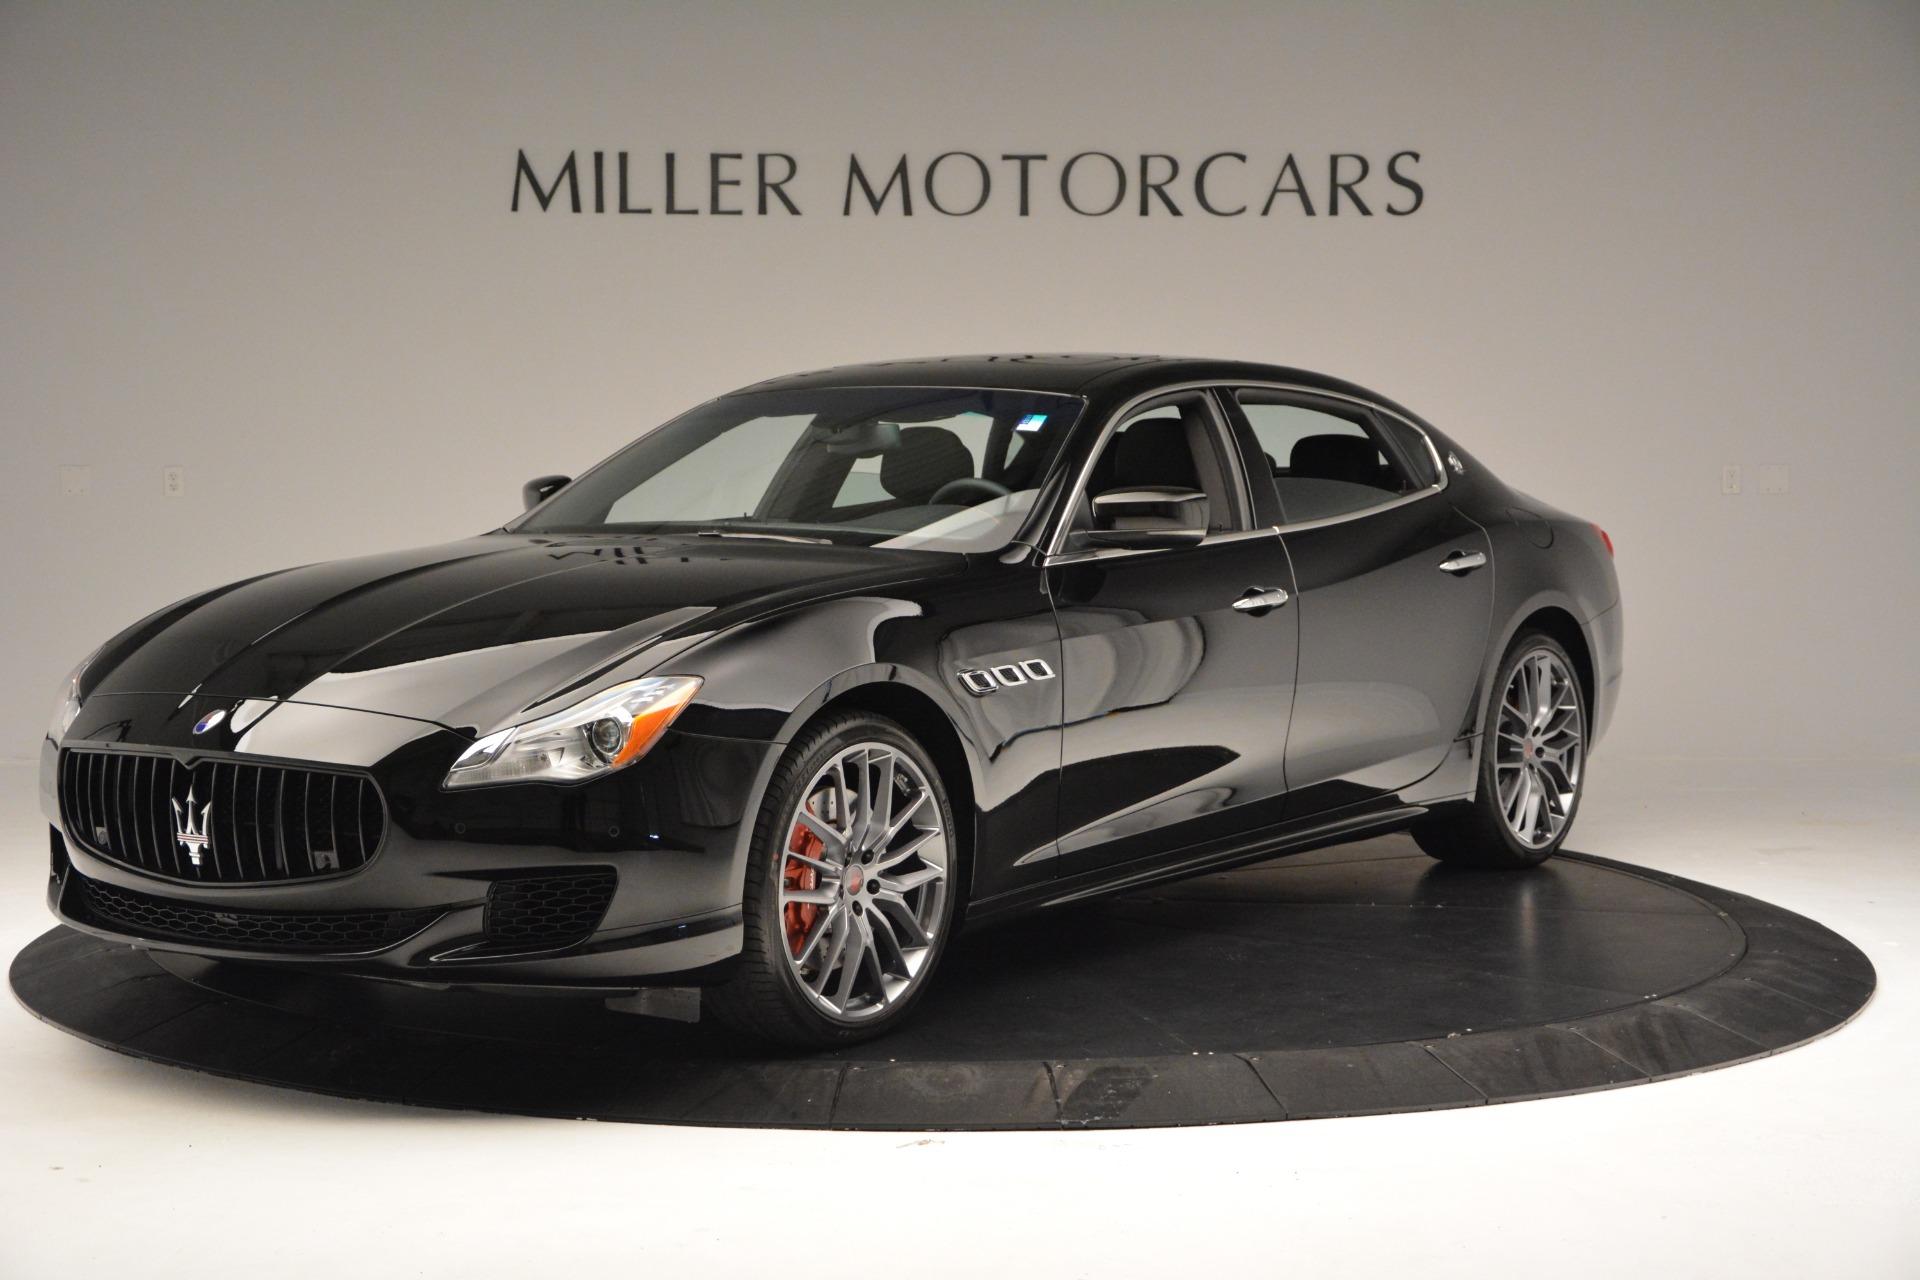 Used 2015 Maserati Quattroporte GTS For Sale In Westport, CT 2993_p2